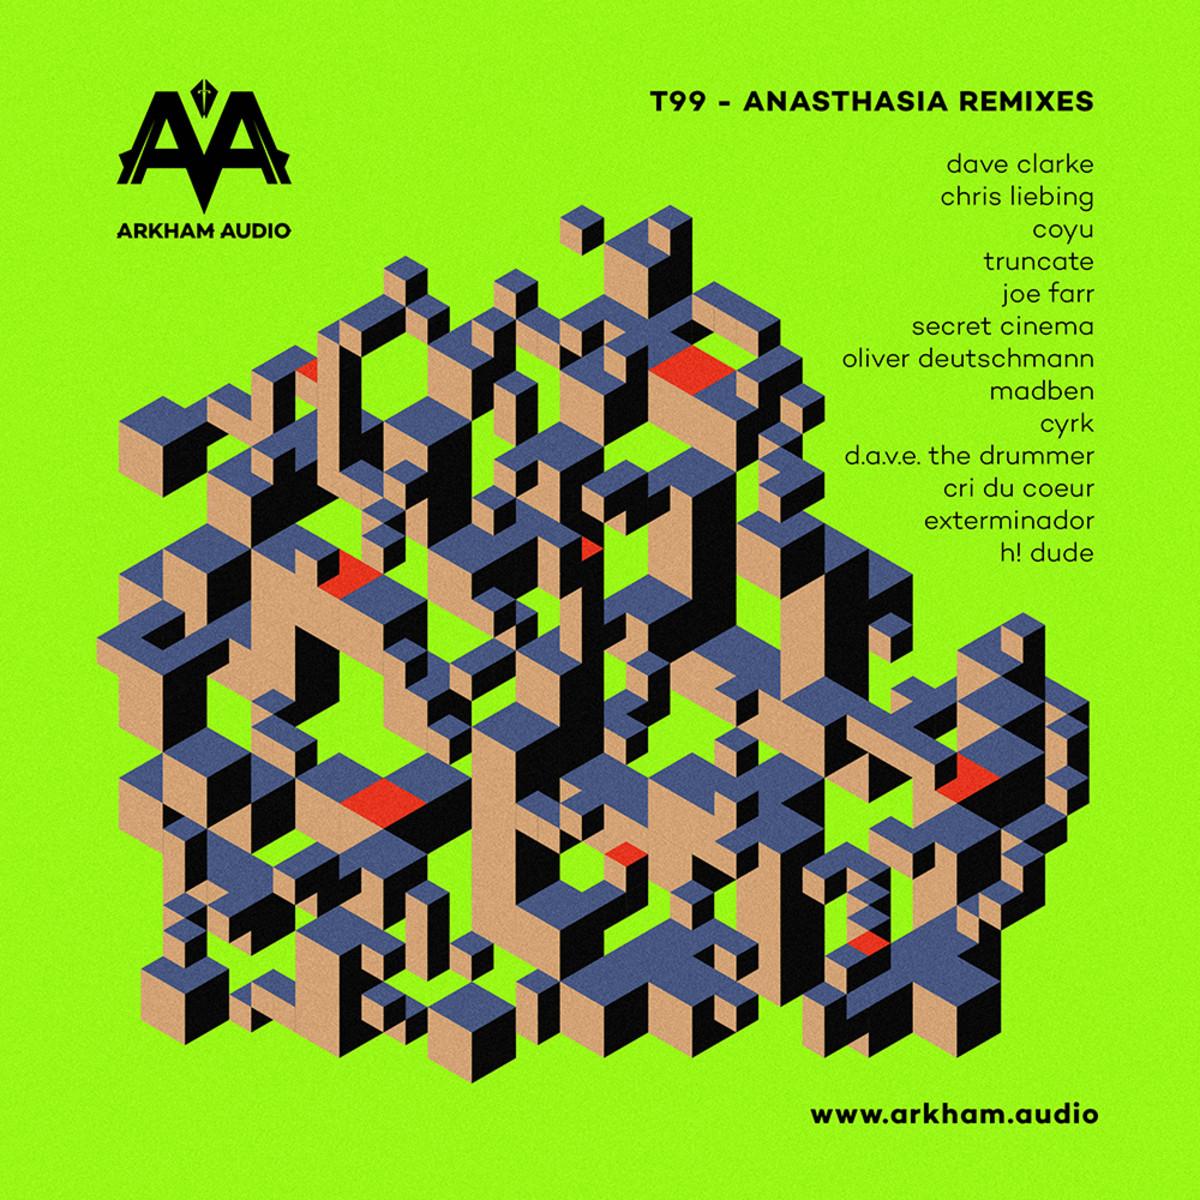 T99 - Anathasia (Cyrk Remix) [Arkham Audio]